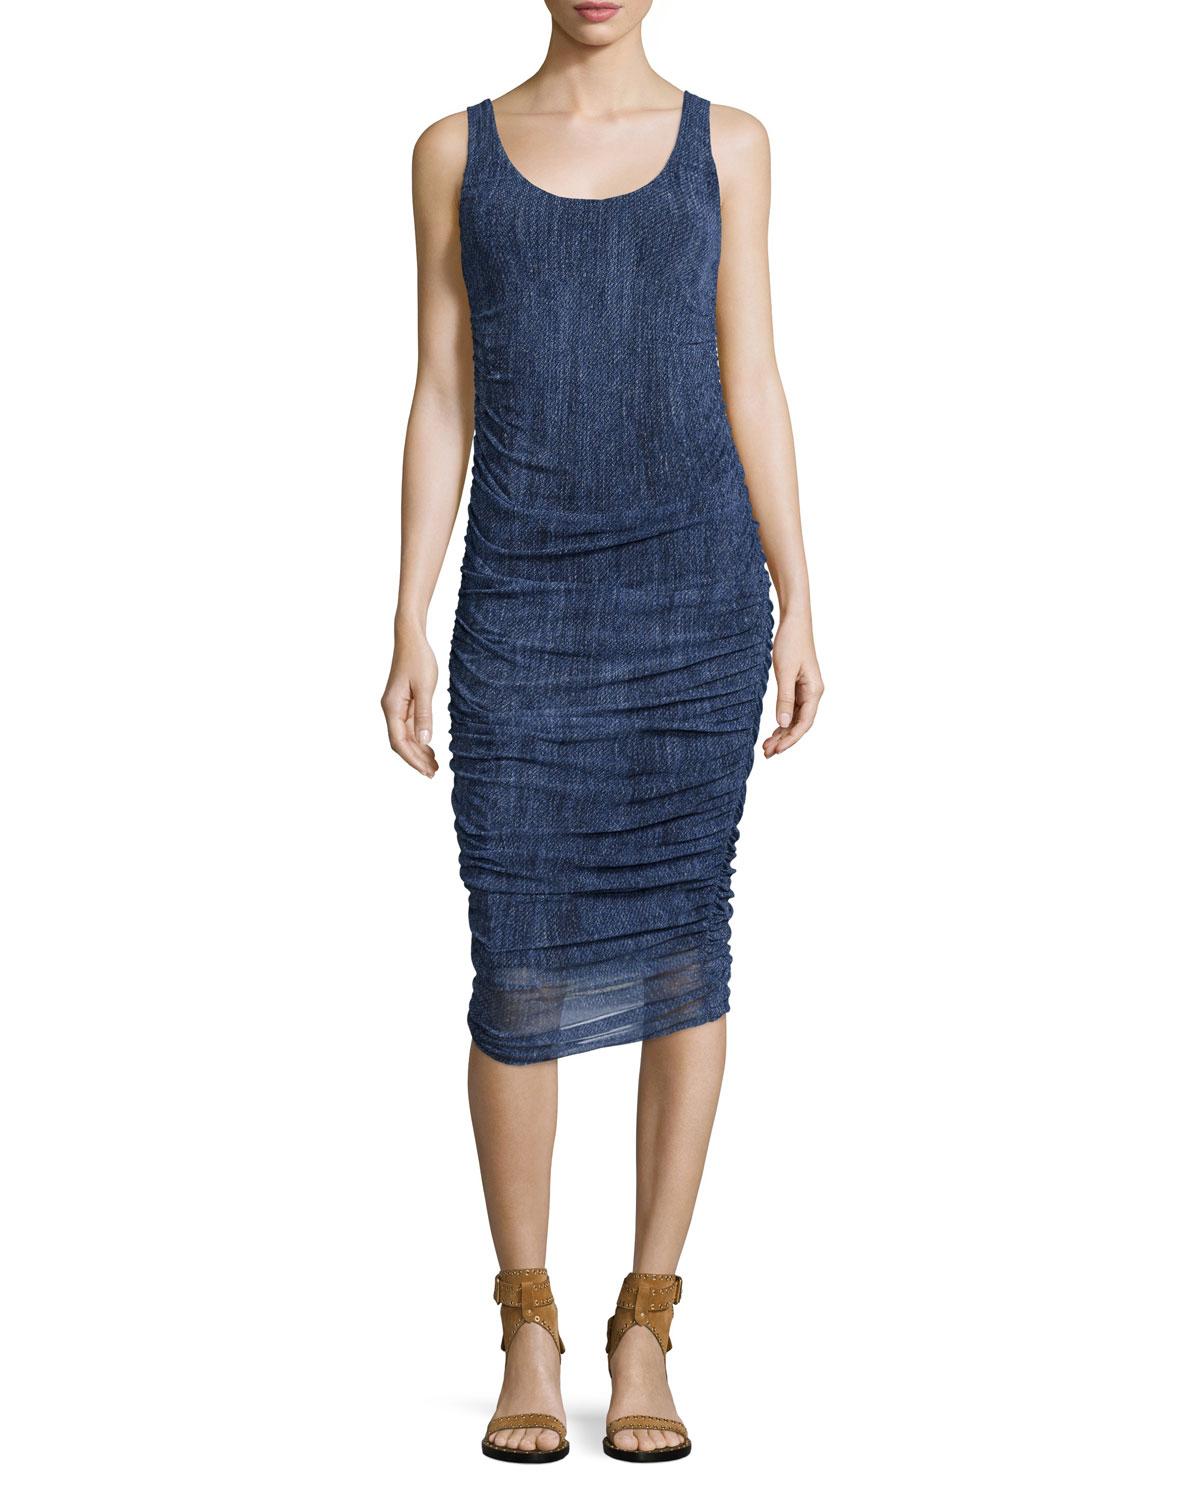 Sleeveless Ruched Knee-Length Denim Dress